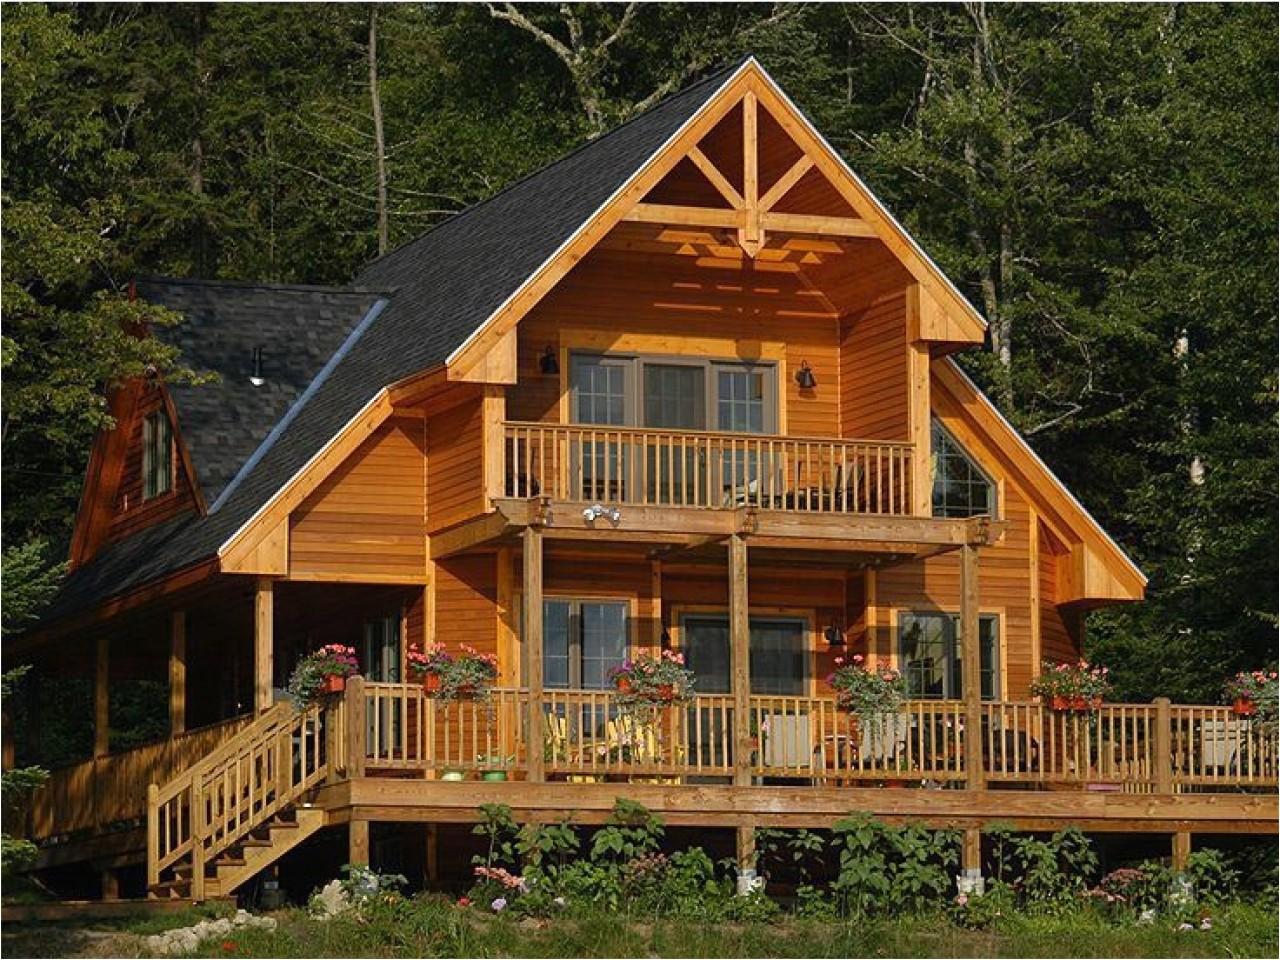 59ecdff509540f7a beach house vacation home floor plans vacation house plans with loft